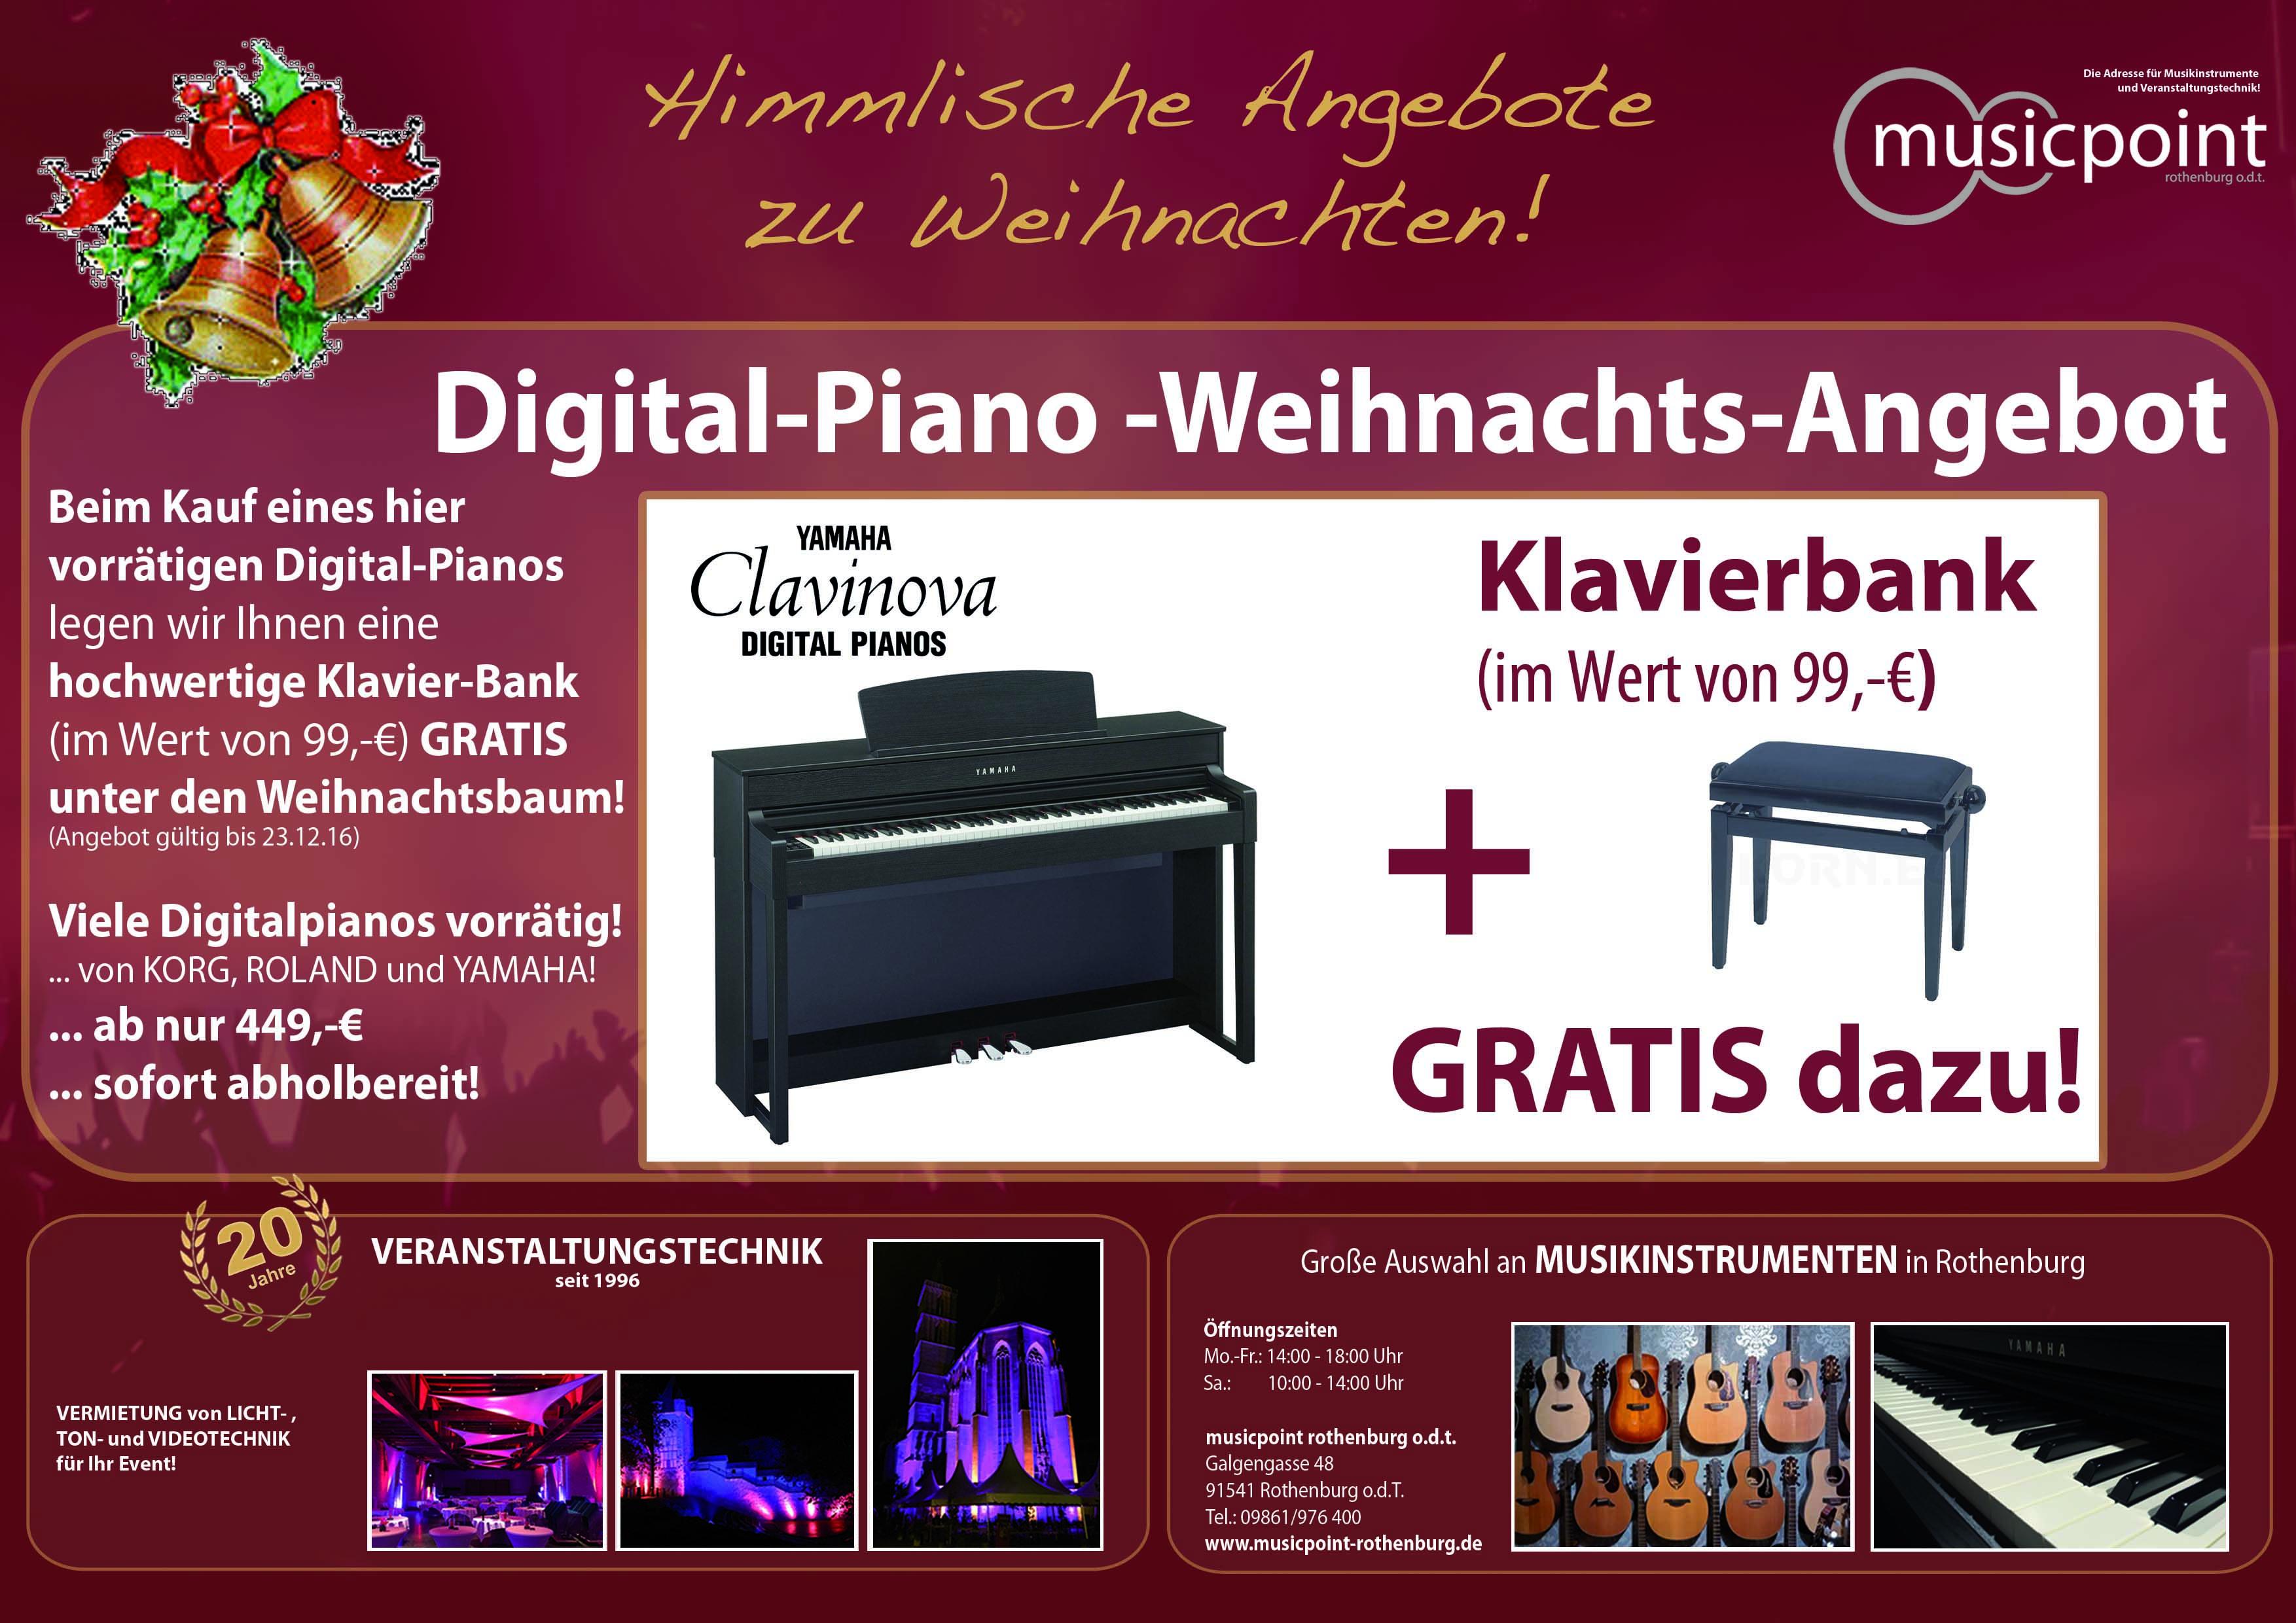 Digital-Piano-Weihnachtsangebot